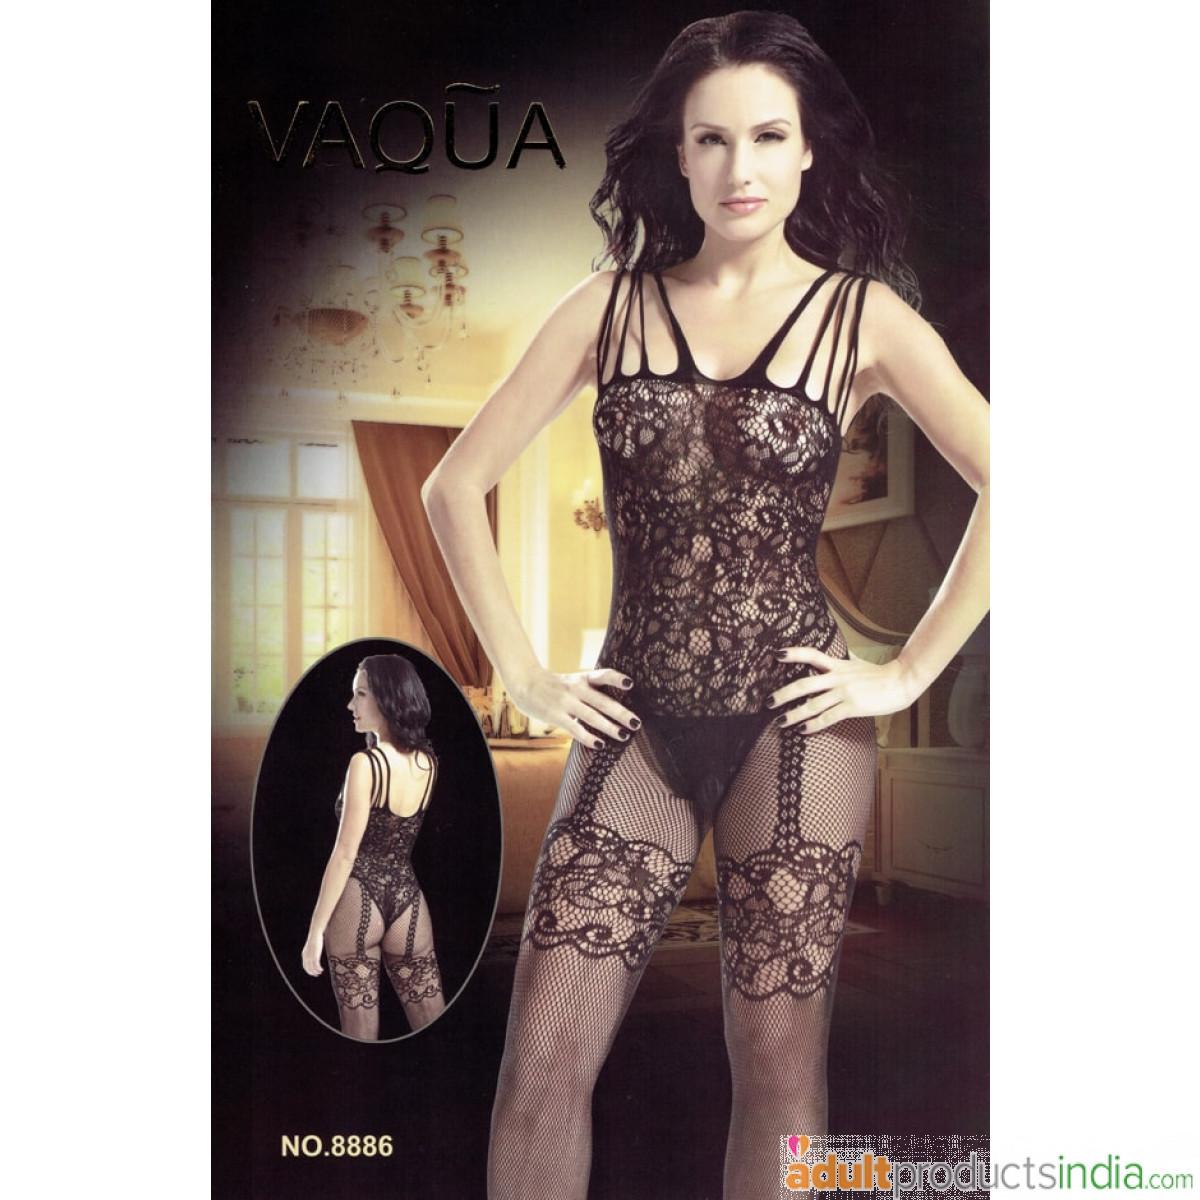 VAQUA Bodystocking No. 8886